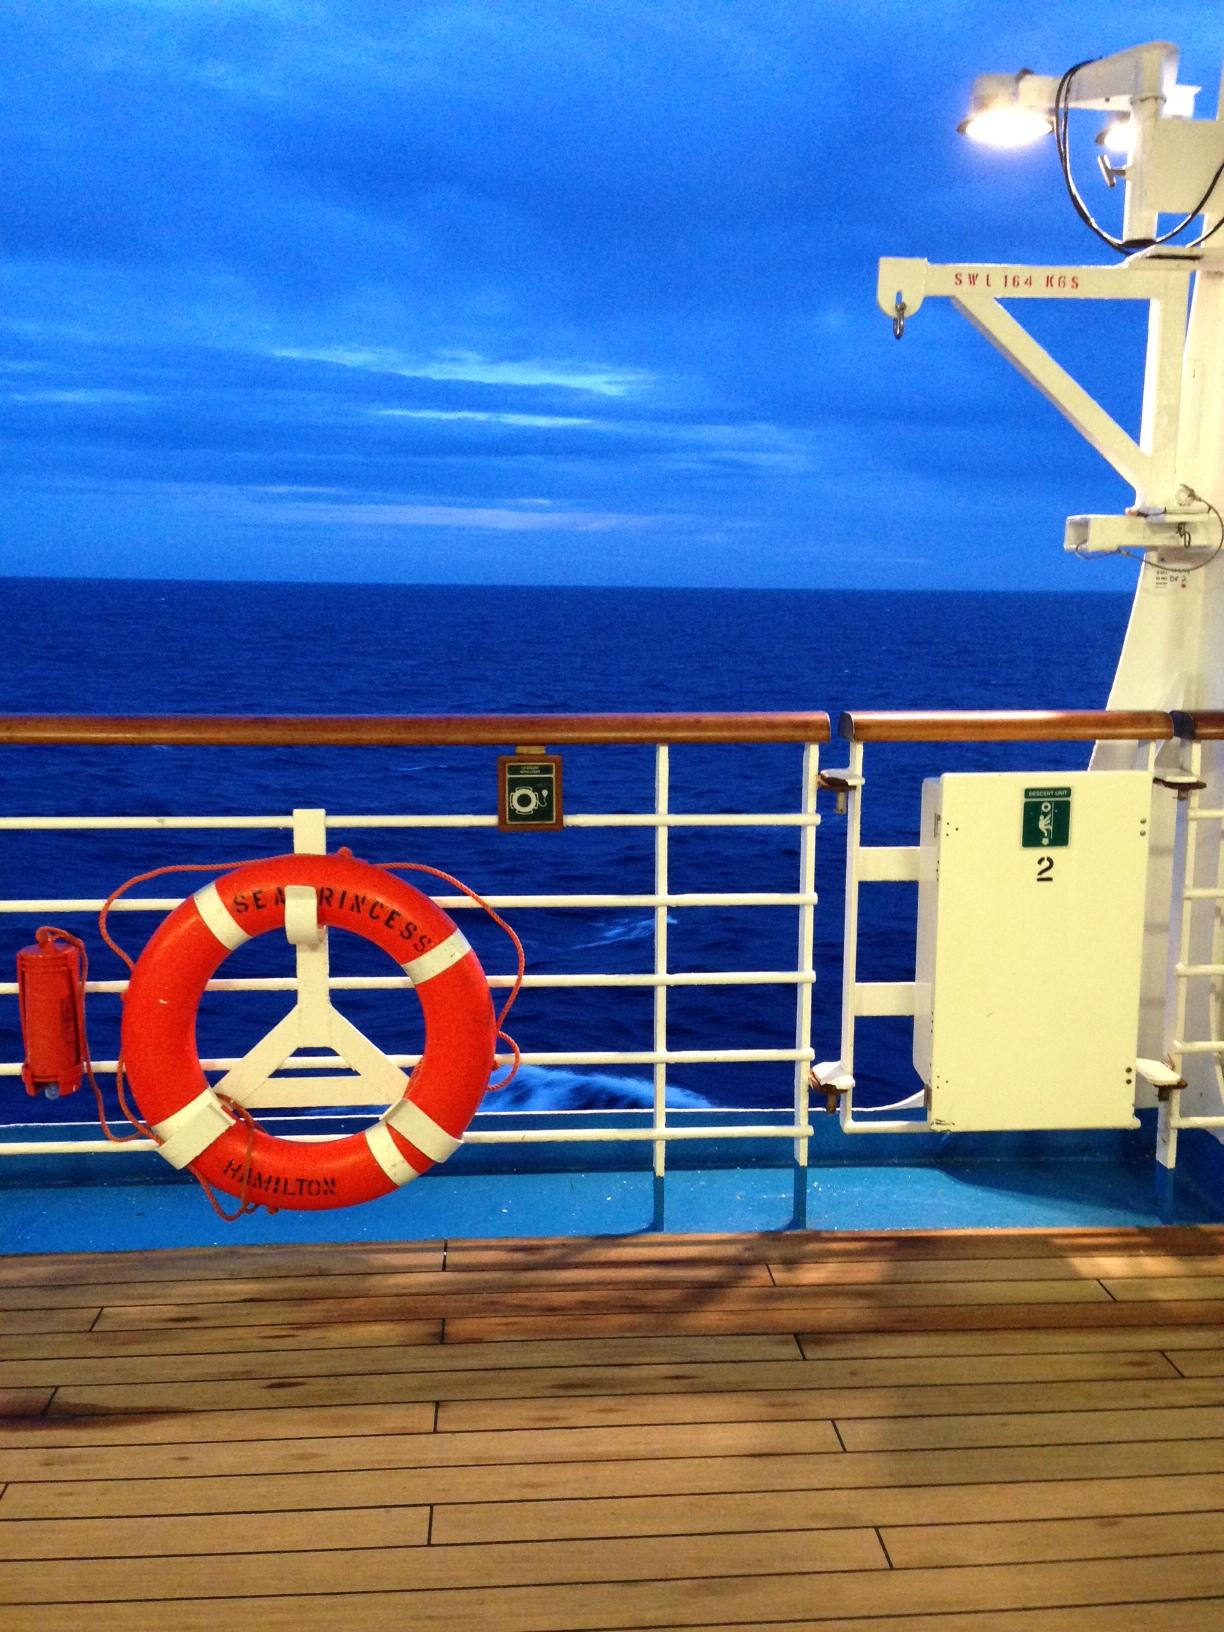 Sea Princess 1 Promenade deck